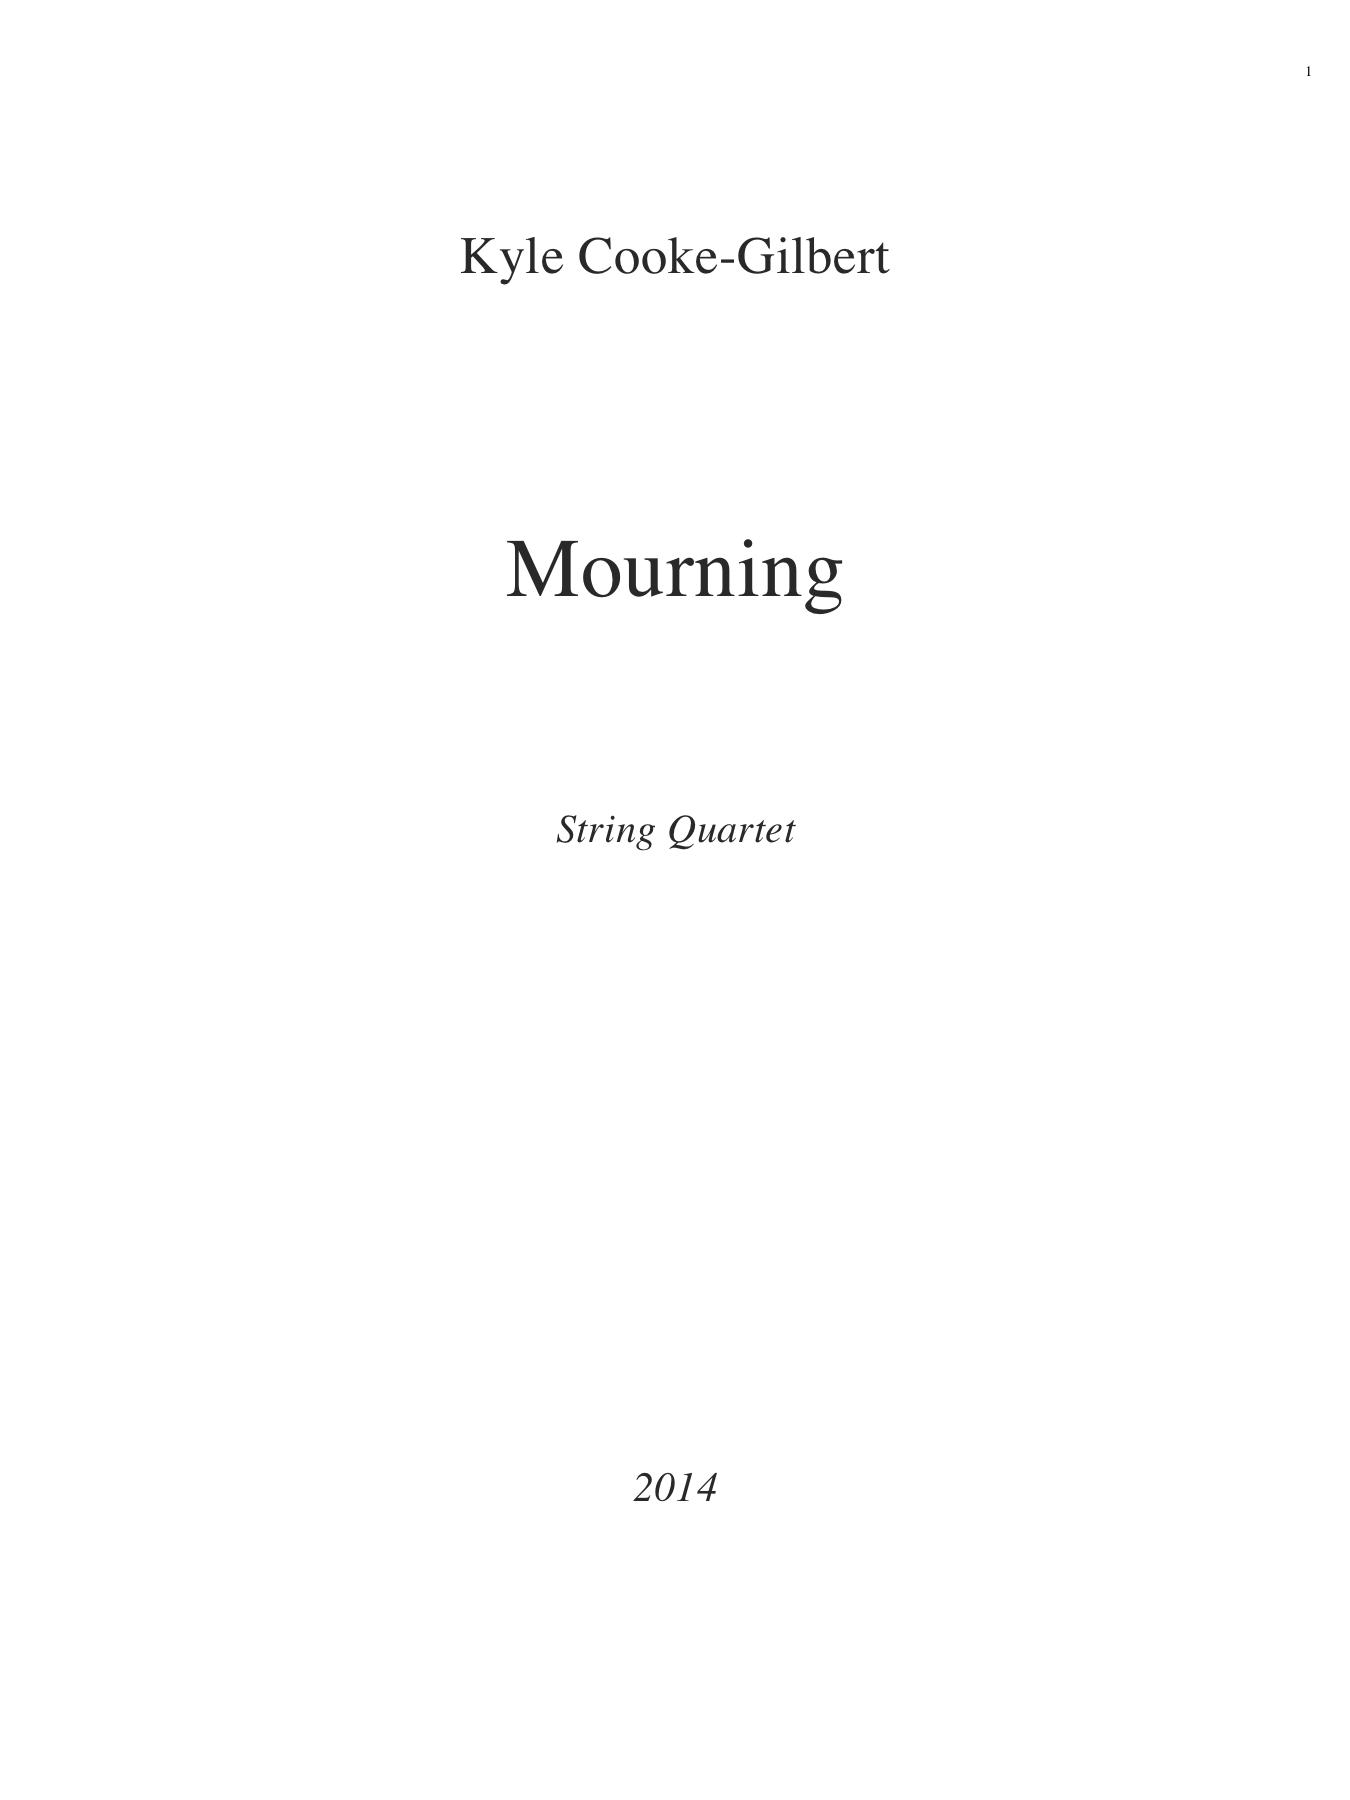 Mourning_StringQuartet.png